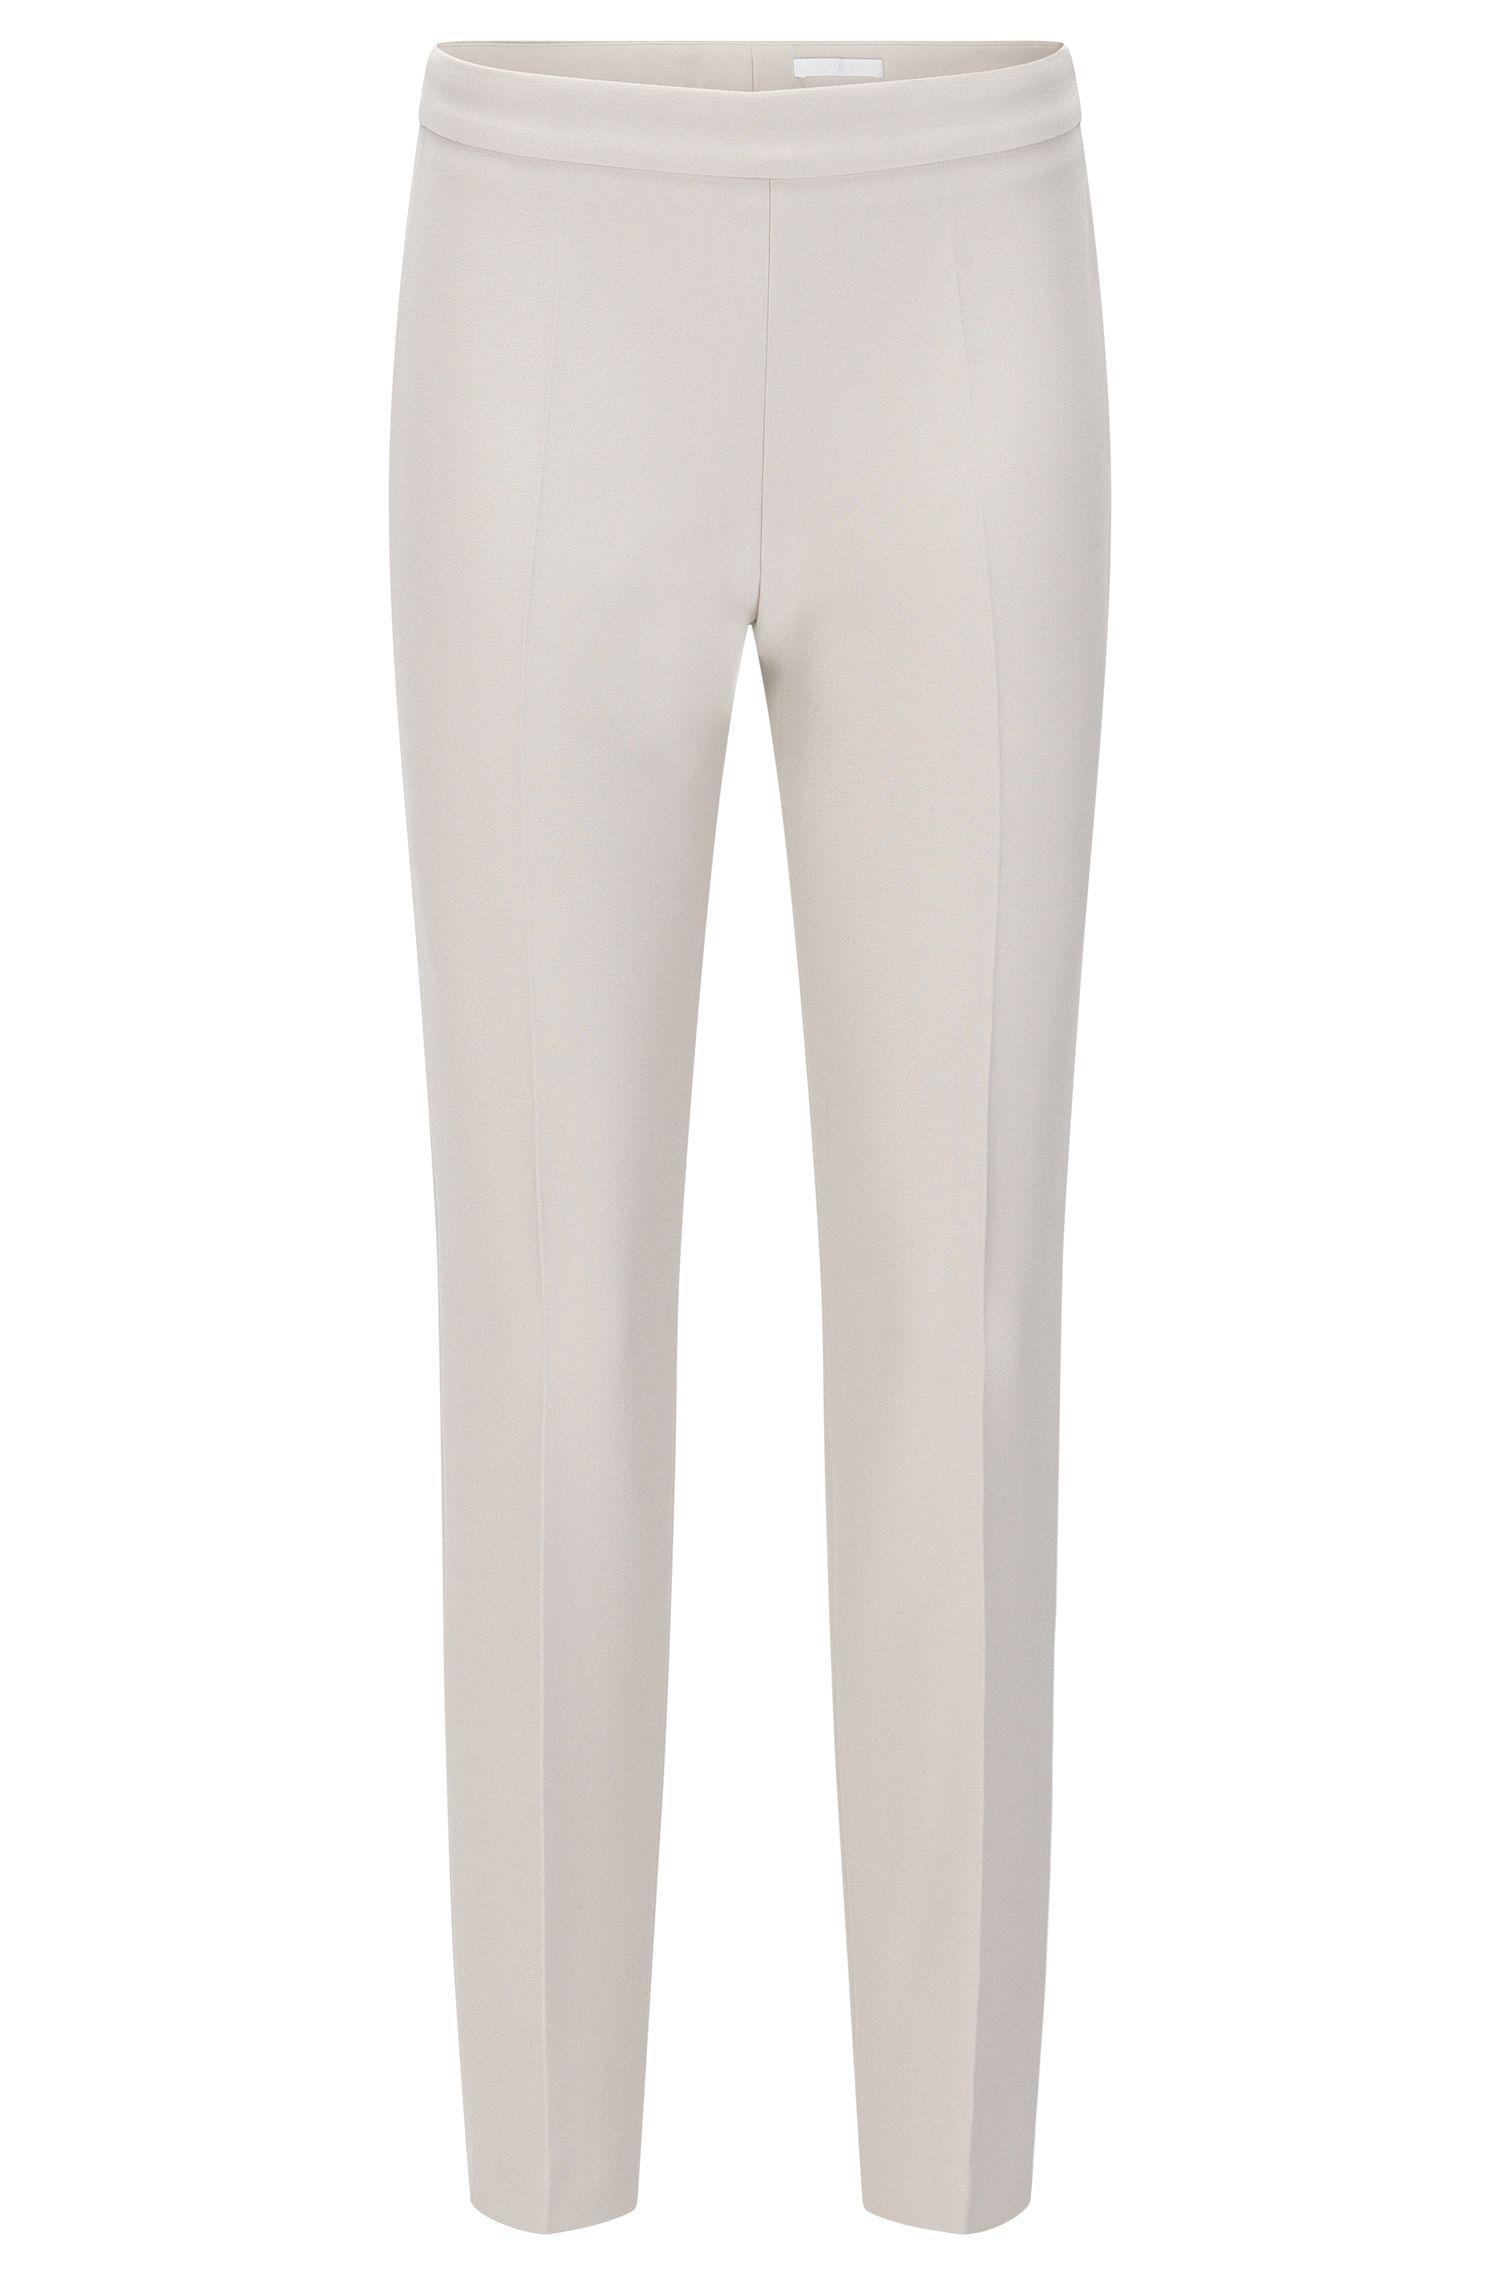 'Tiluna Side Zip' | Stretch Cotton Blend Dress Pants